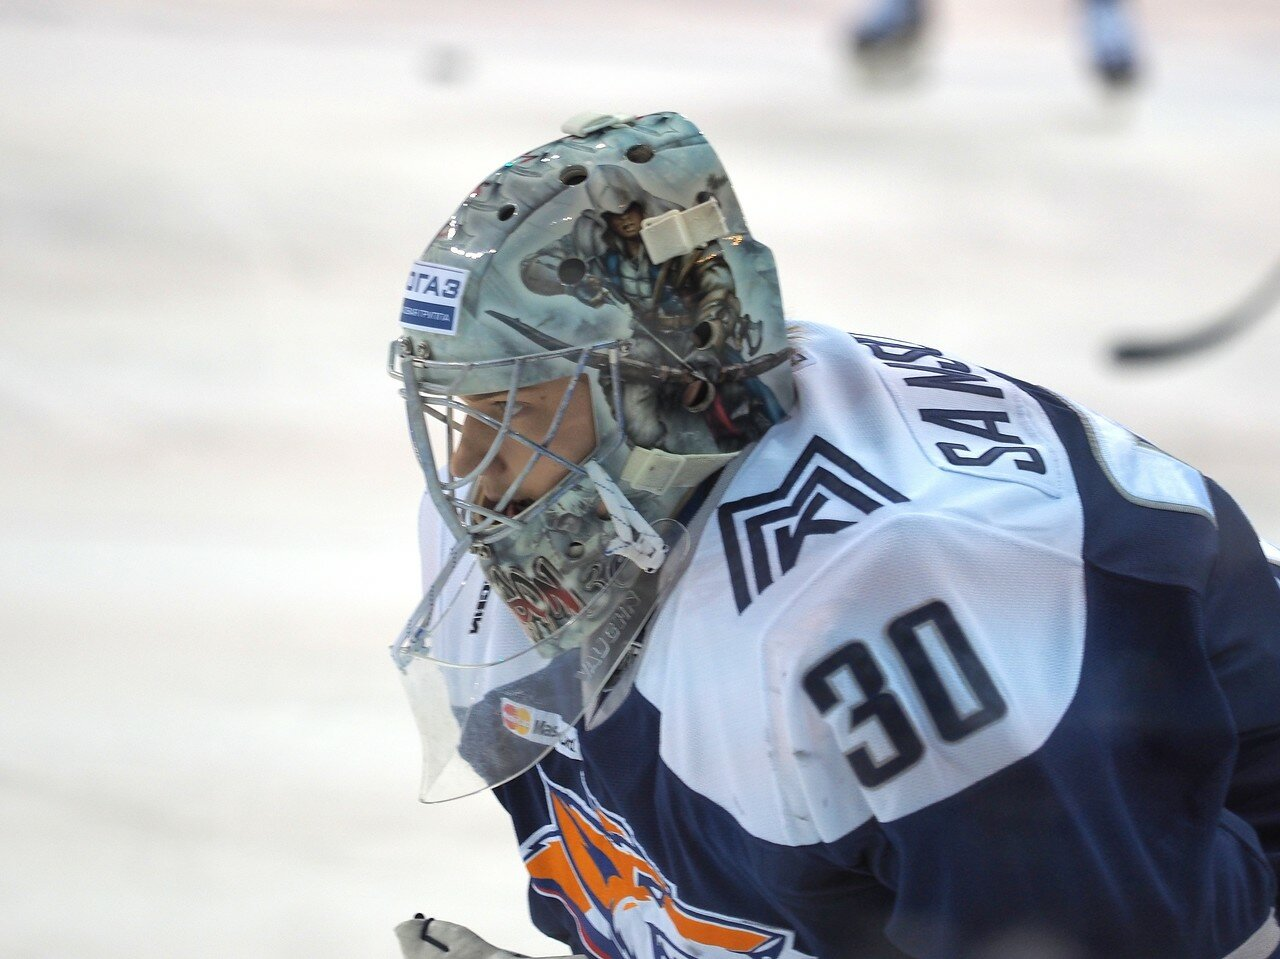 33Восток 1/2 плей-офф Металлург - Сибирь 08.03.2016